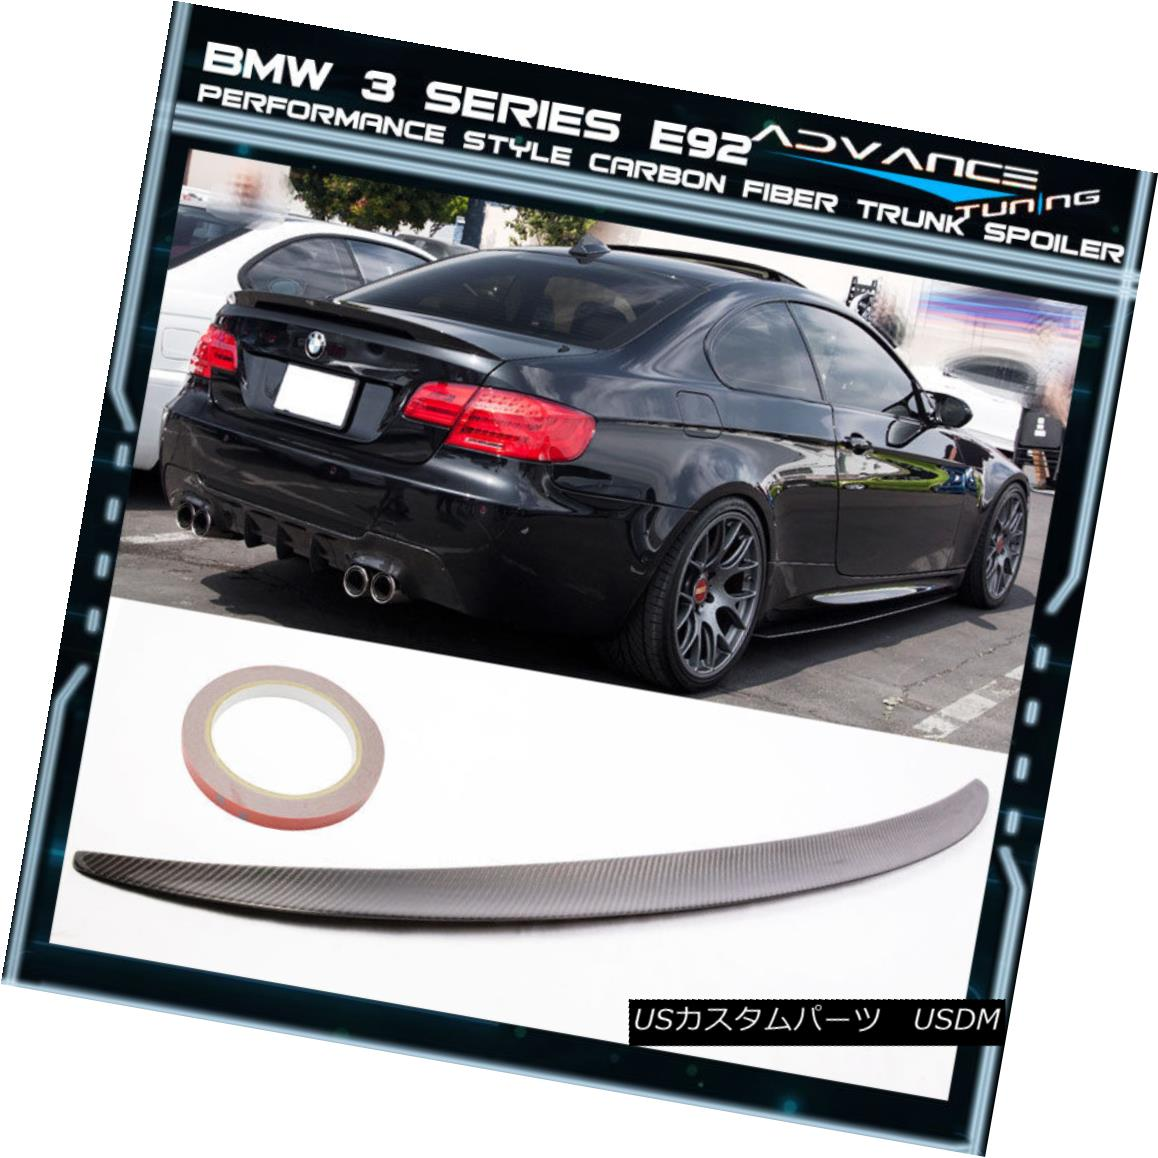 Carbon Fiber Rear Trunk Spoiler for 07-13 BMW E93 3 Series M3 Convertible Type A